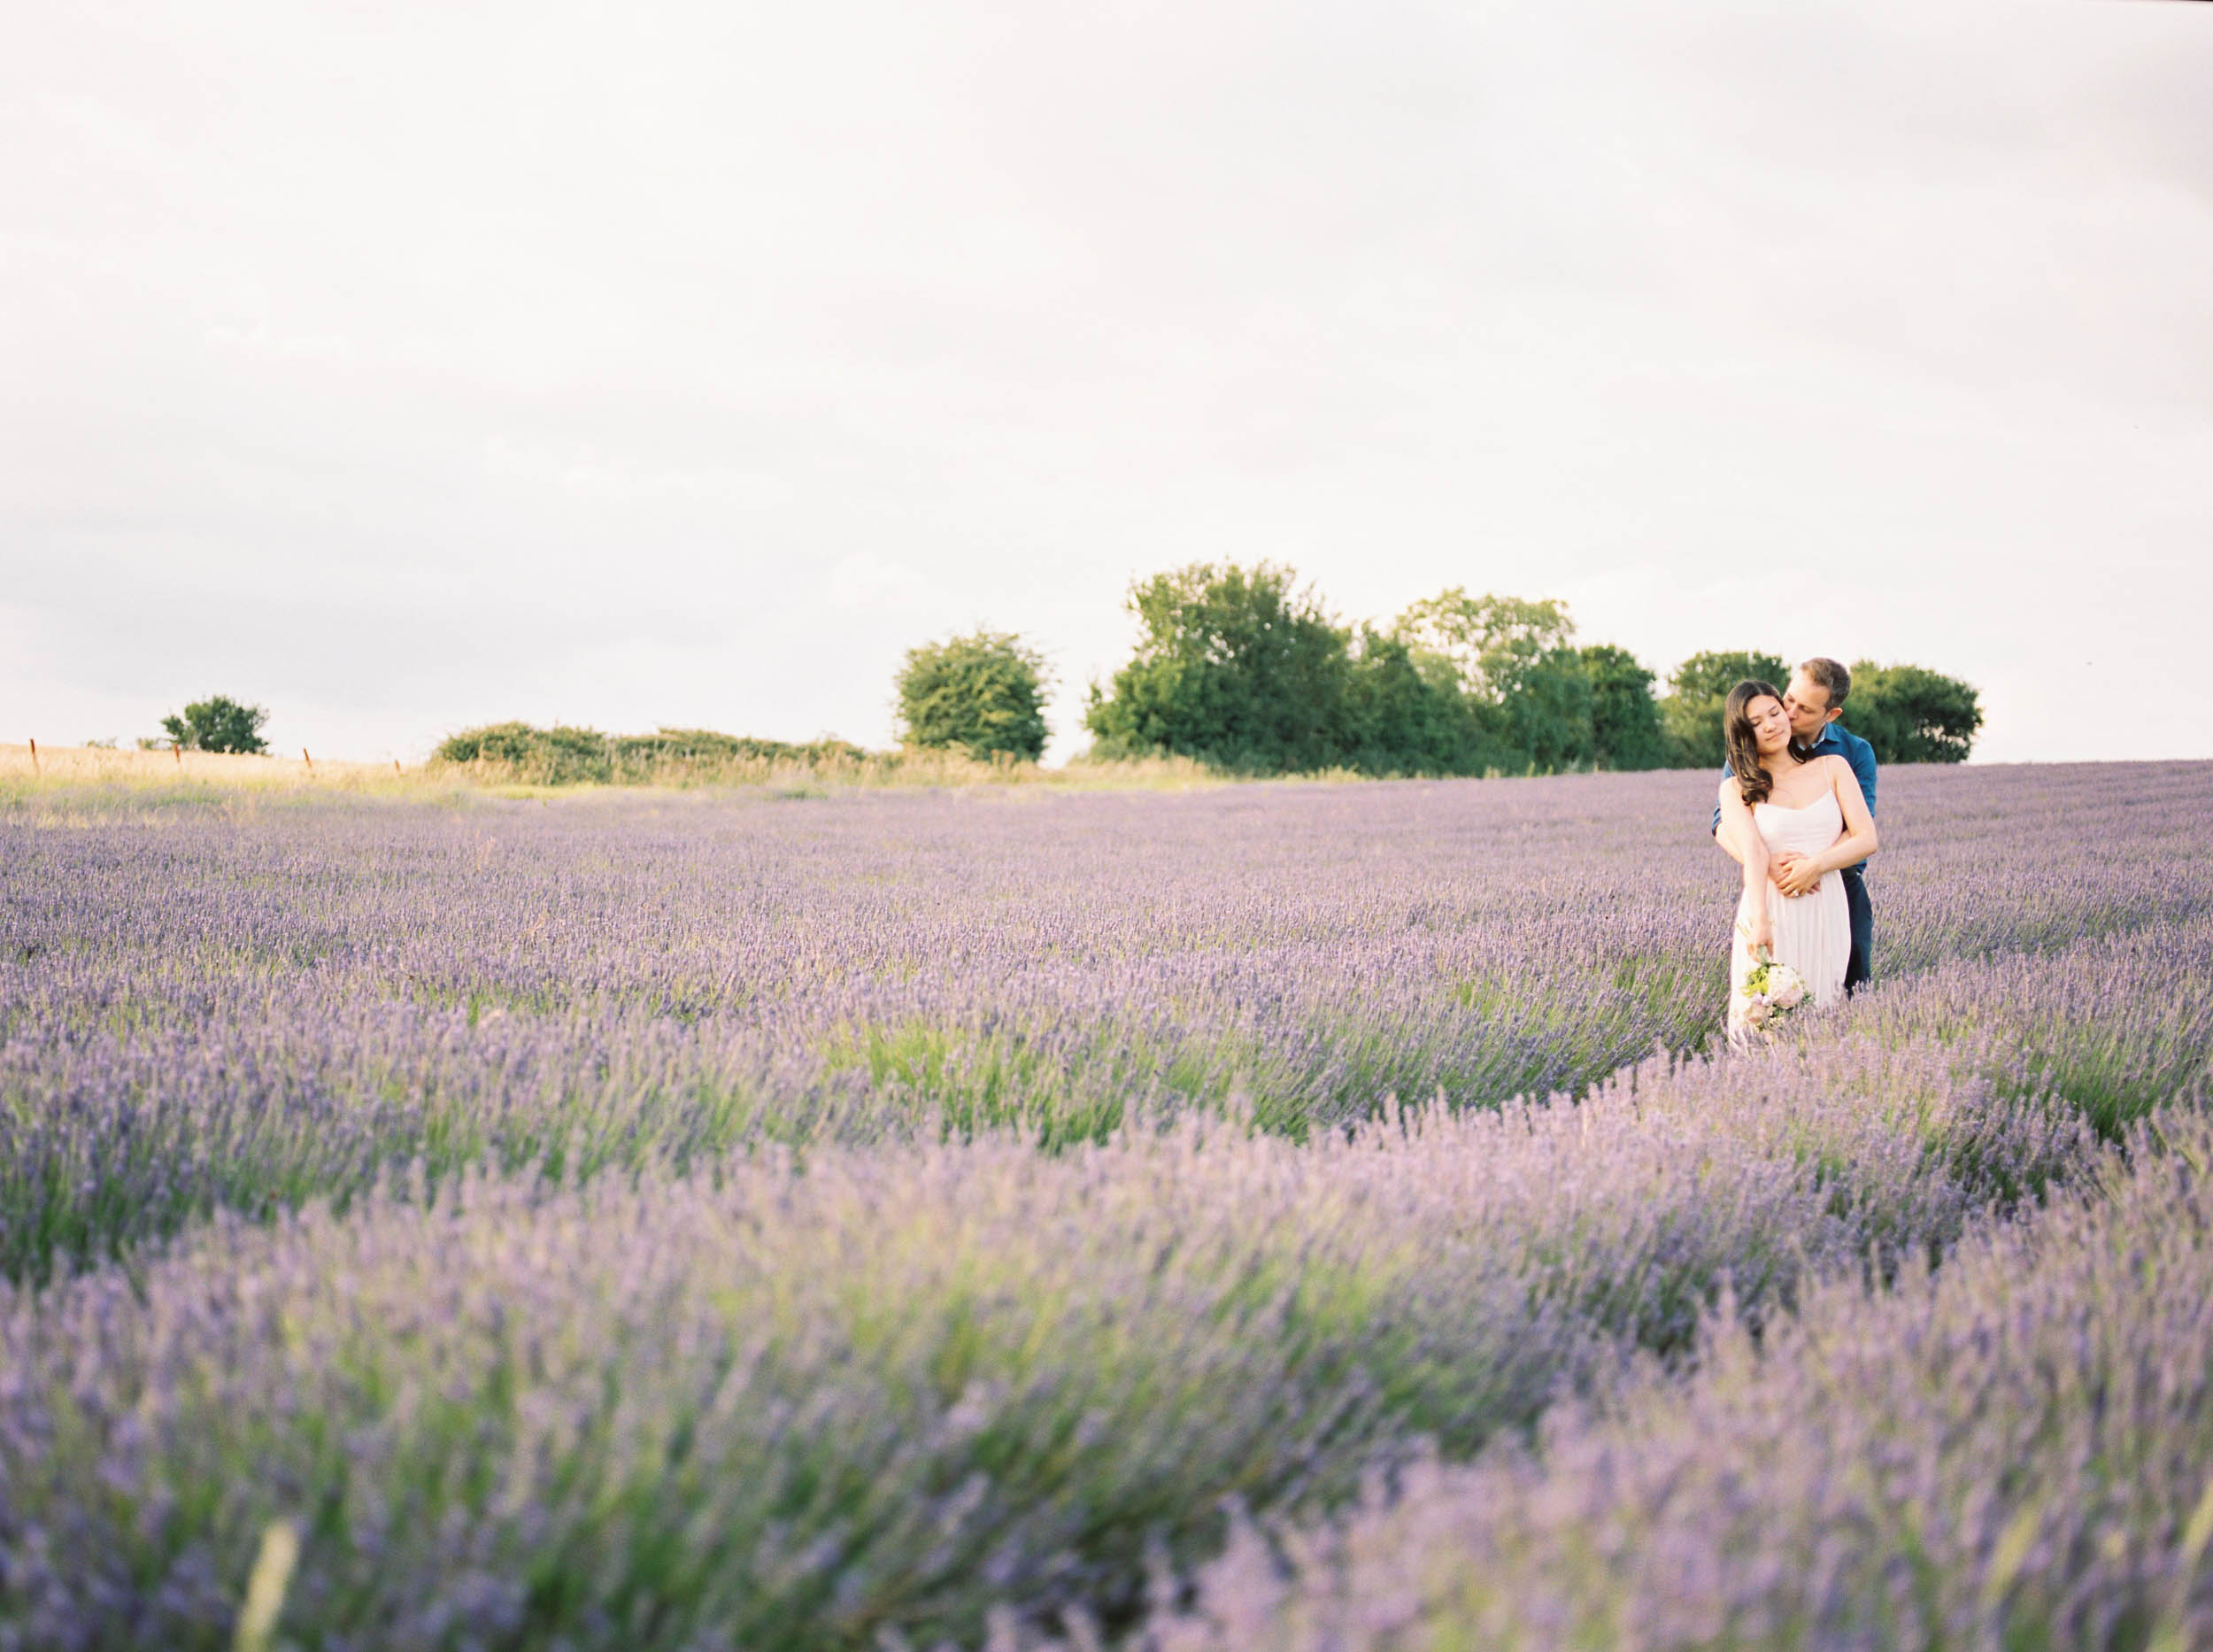 Amy O'Boyle Photography- Destination & UK Fine Art Film Wedding Photographer- Hitchin Lavender Engagement Shoot-15.jpg